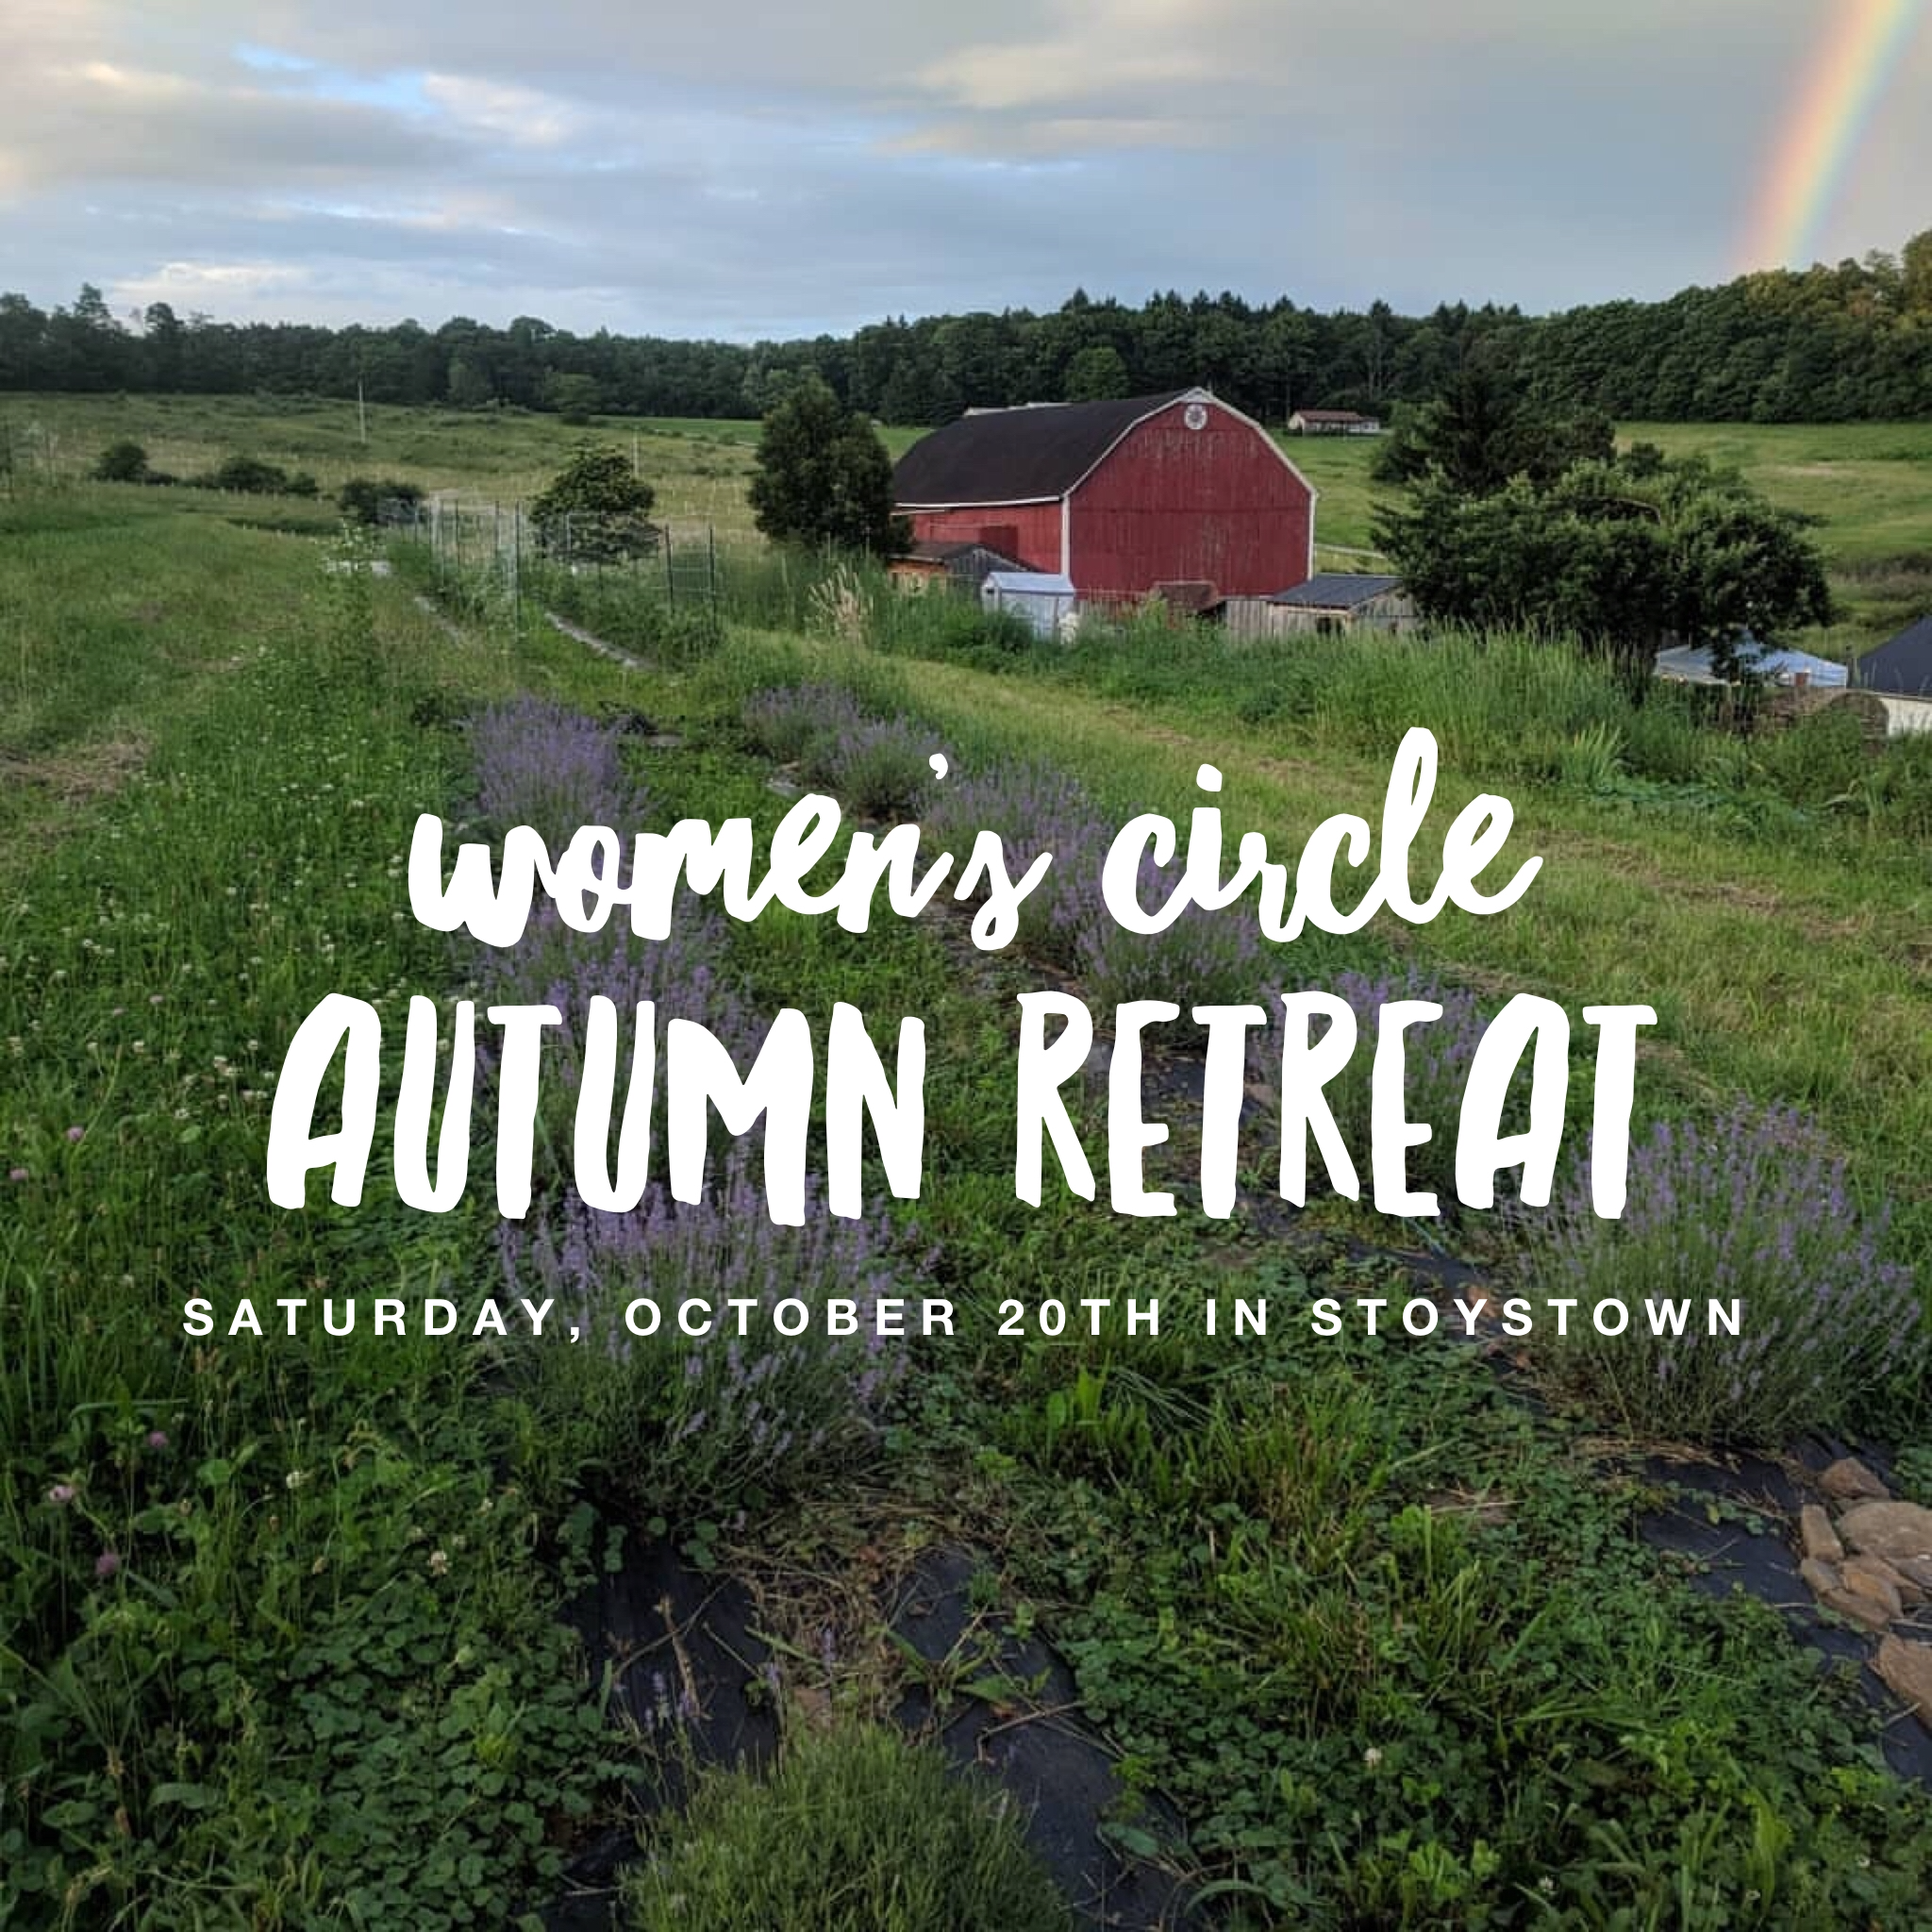 Women's Circle Autumn Retreat in Stoystown